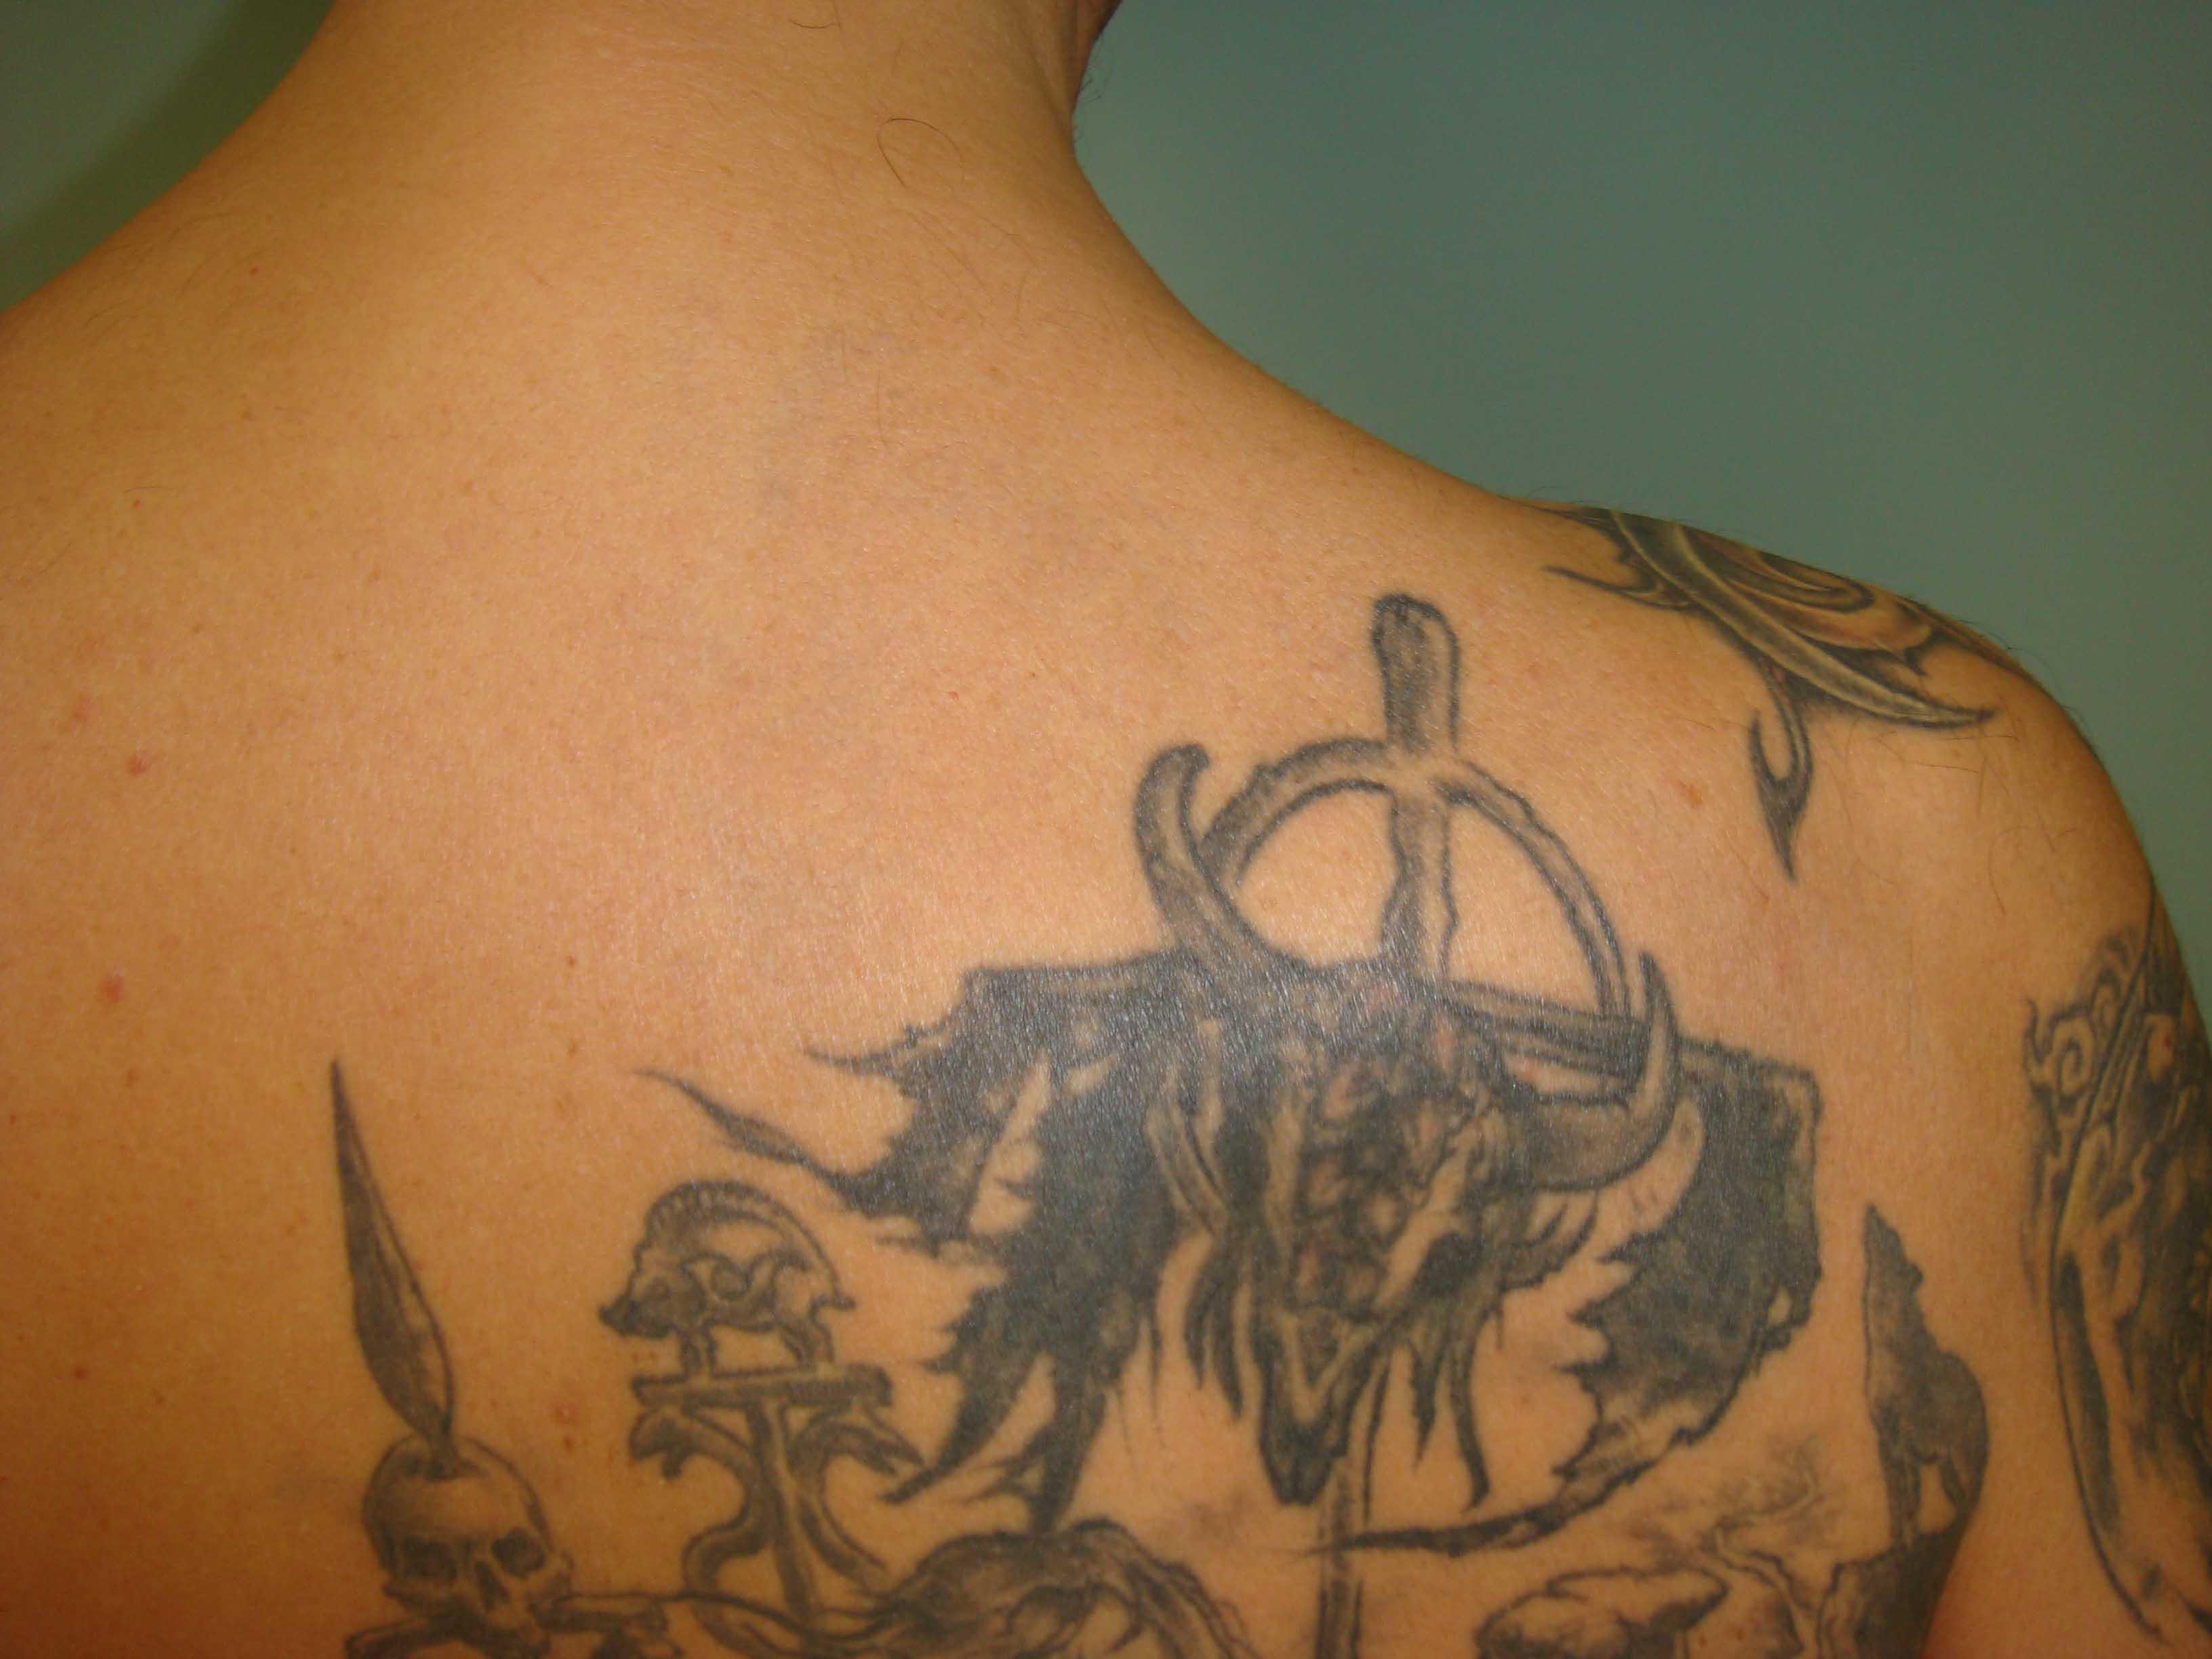 Rimozioni tatuaggi Roma | Dott. Erik Geiger